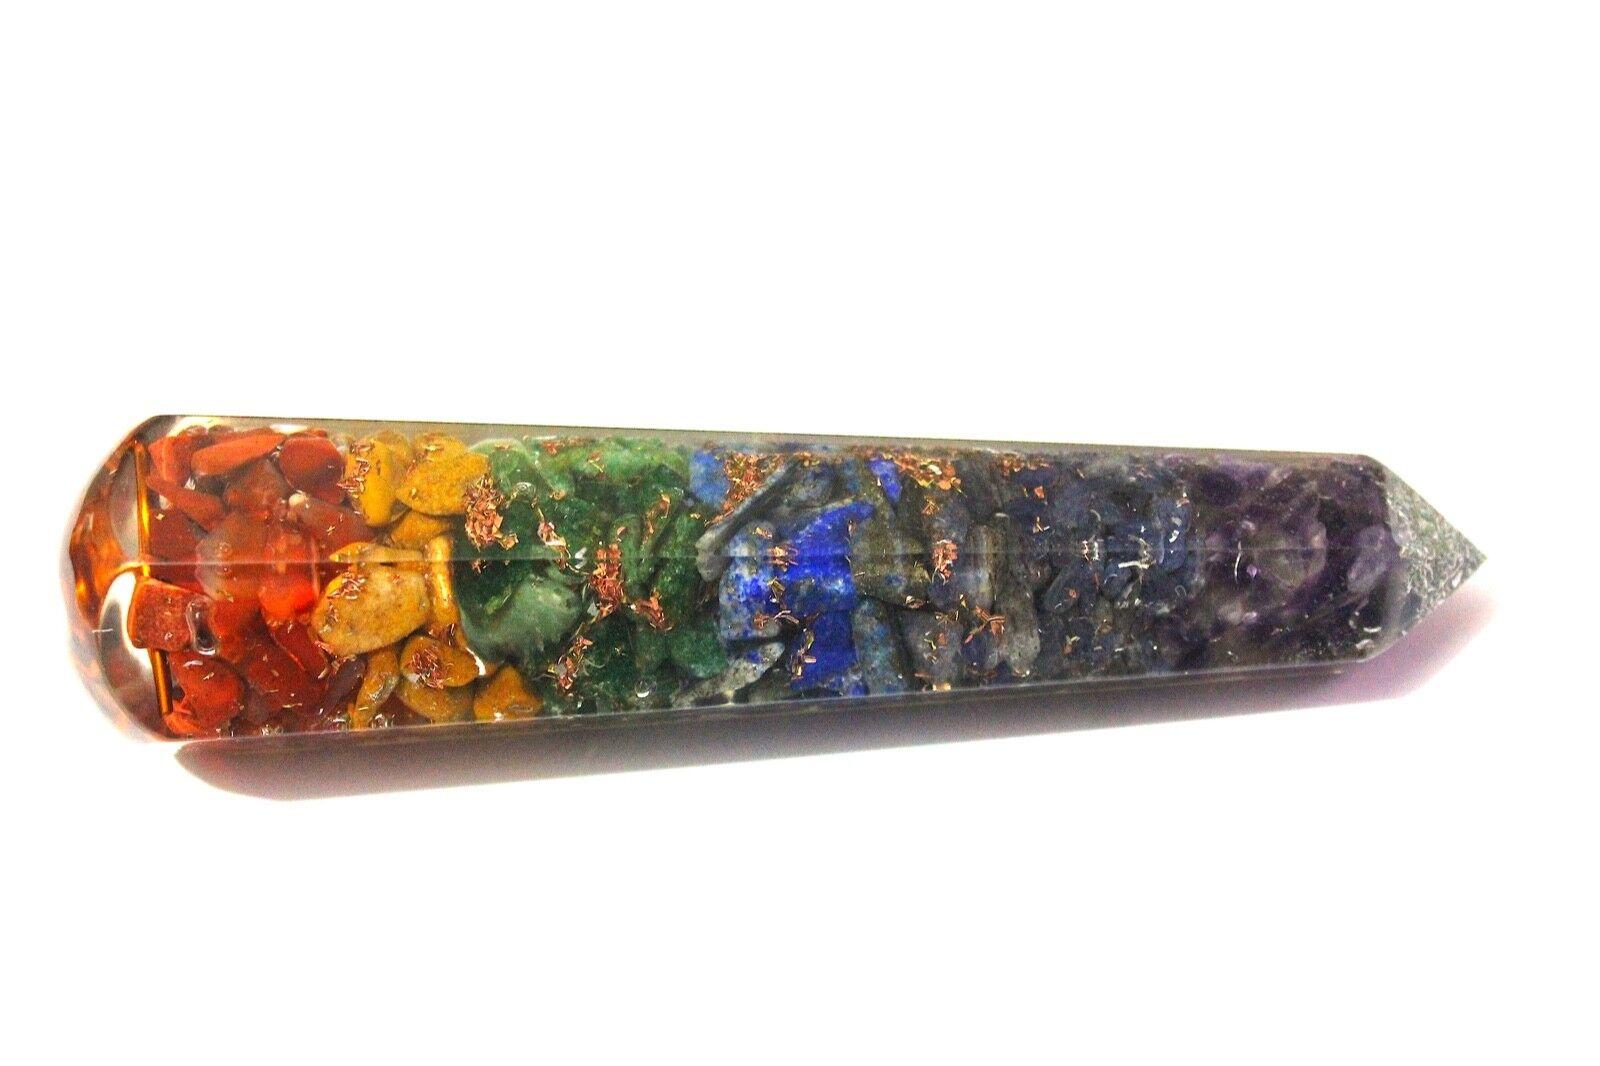 Reiki Energy Charged Amethyst Crystal Orgone Pyramid Powerful Energy GeneratorUK